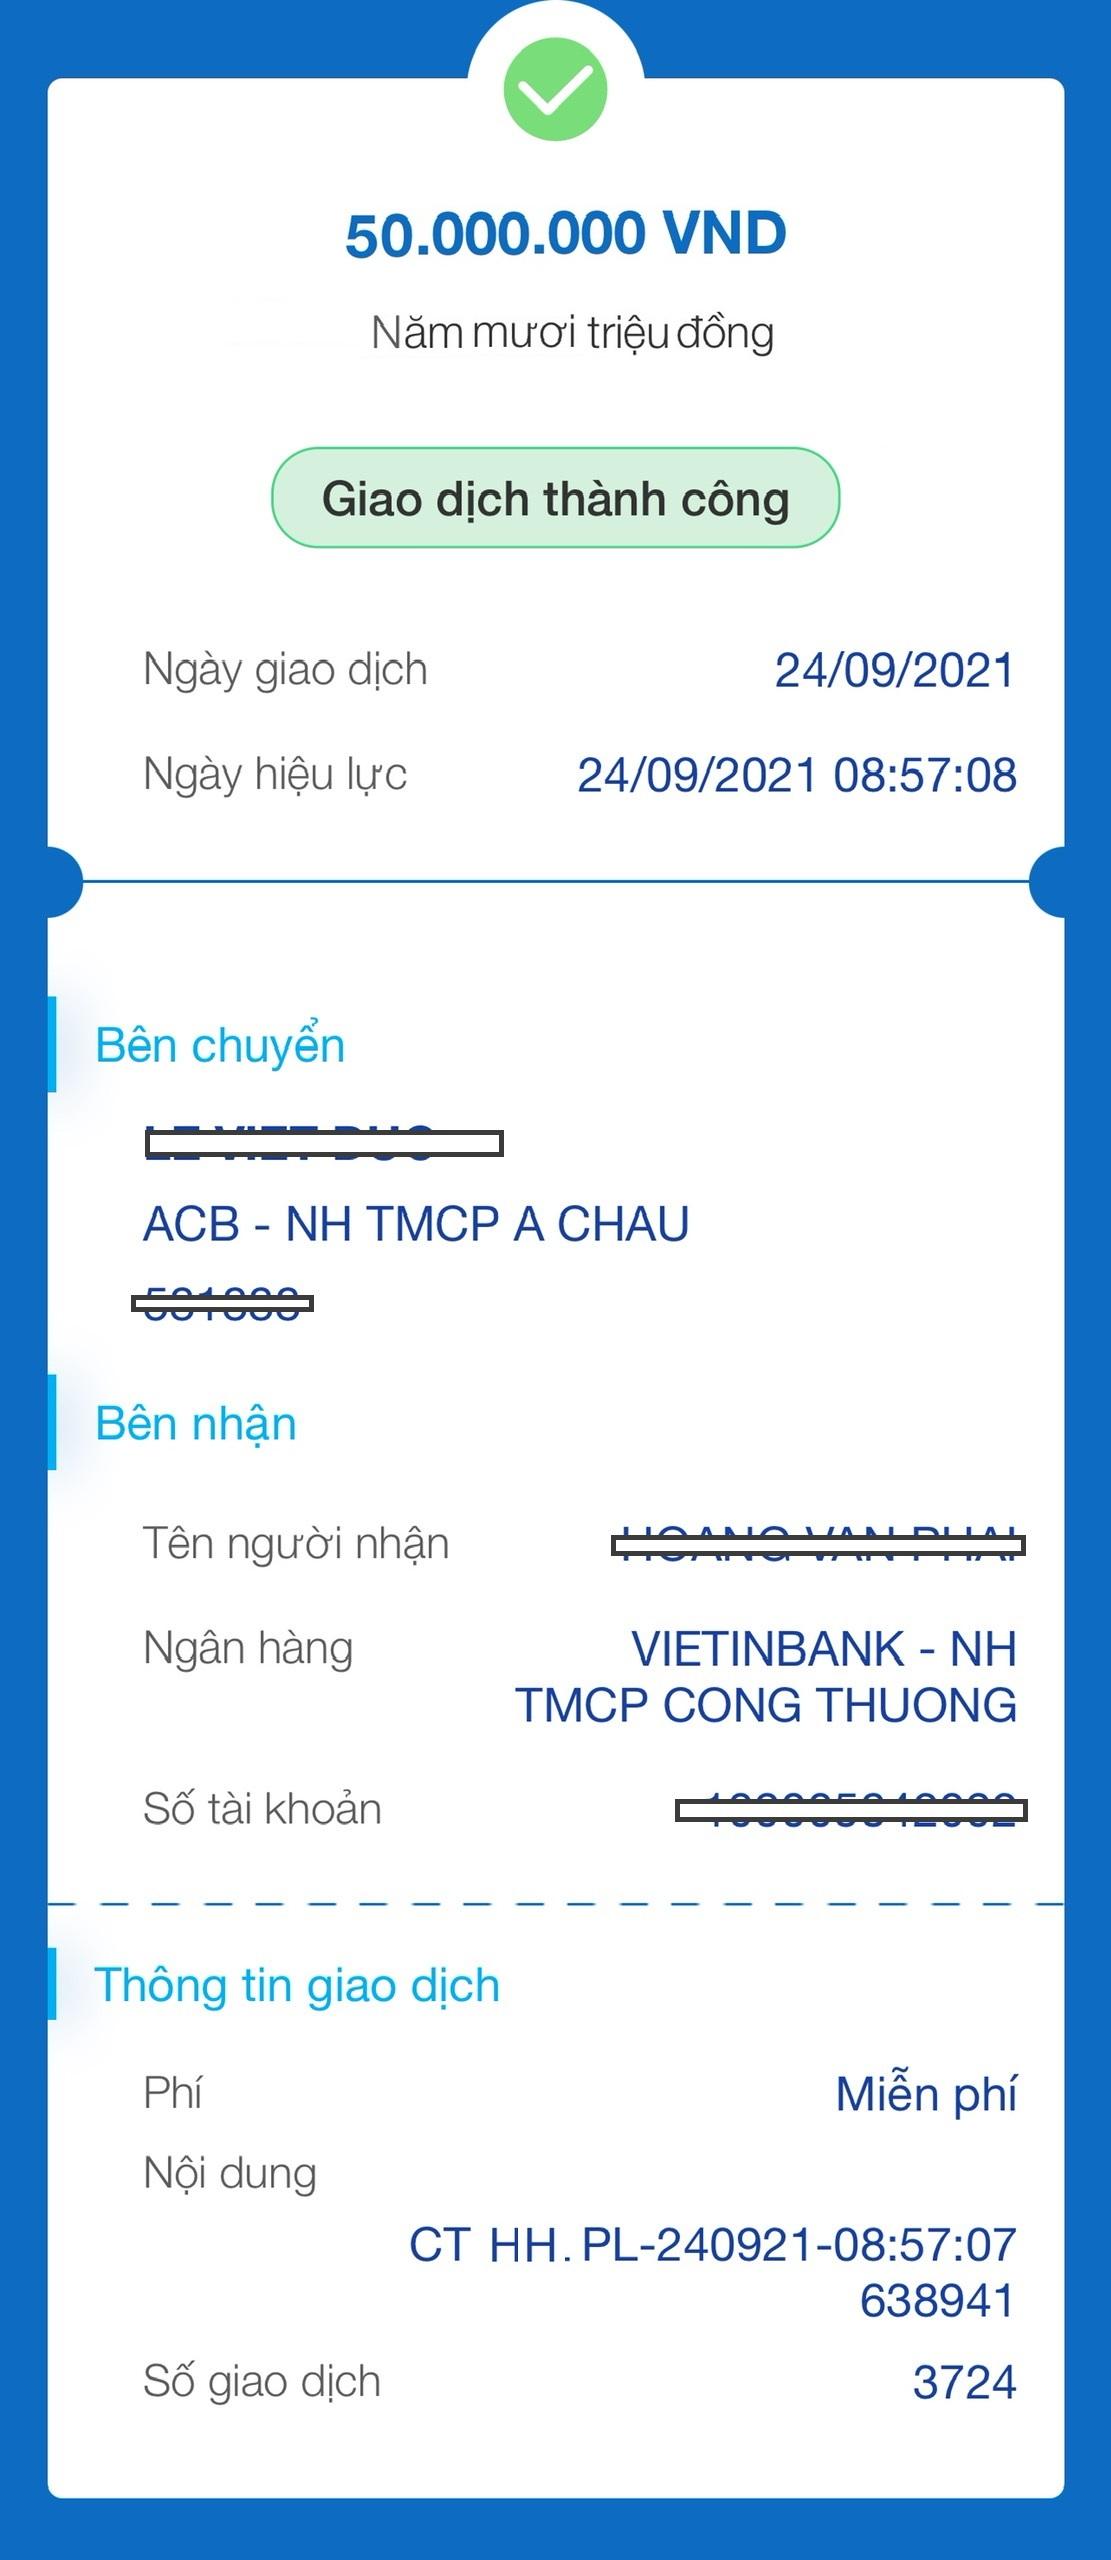 Phế liệu Bảo Minh chi hoa hồng